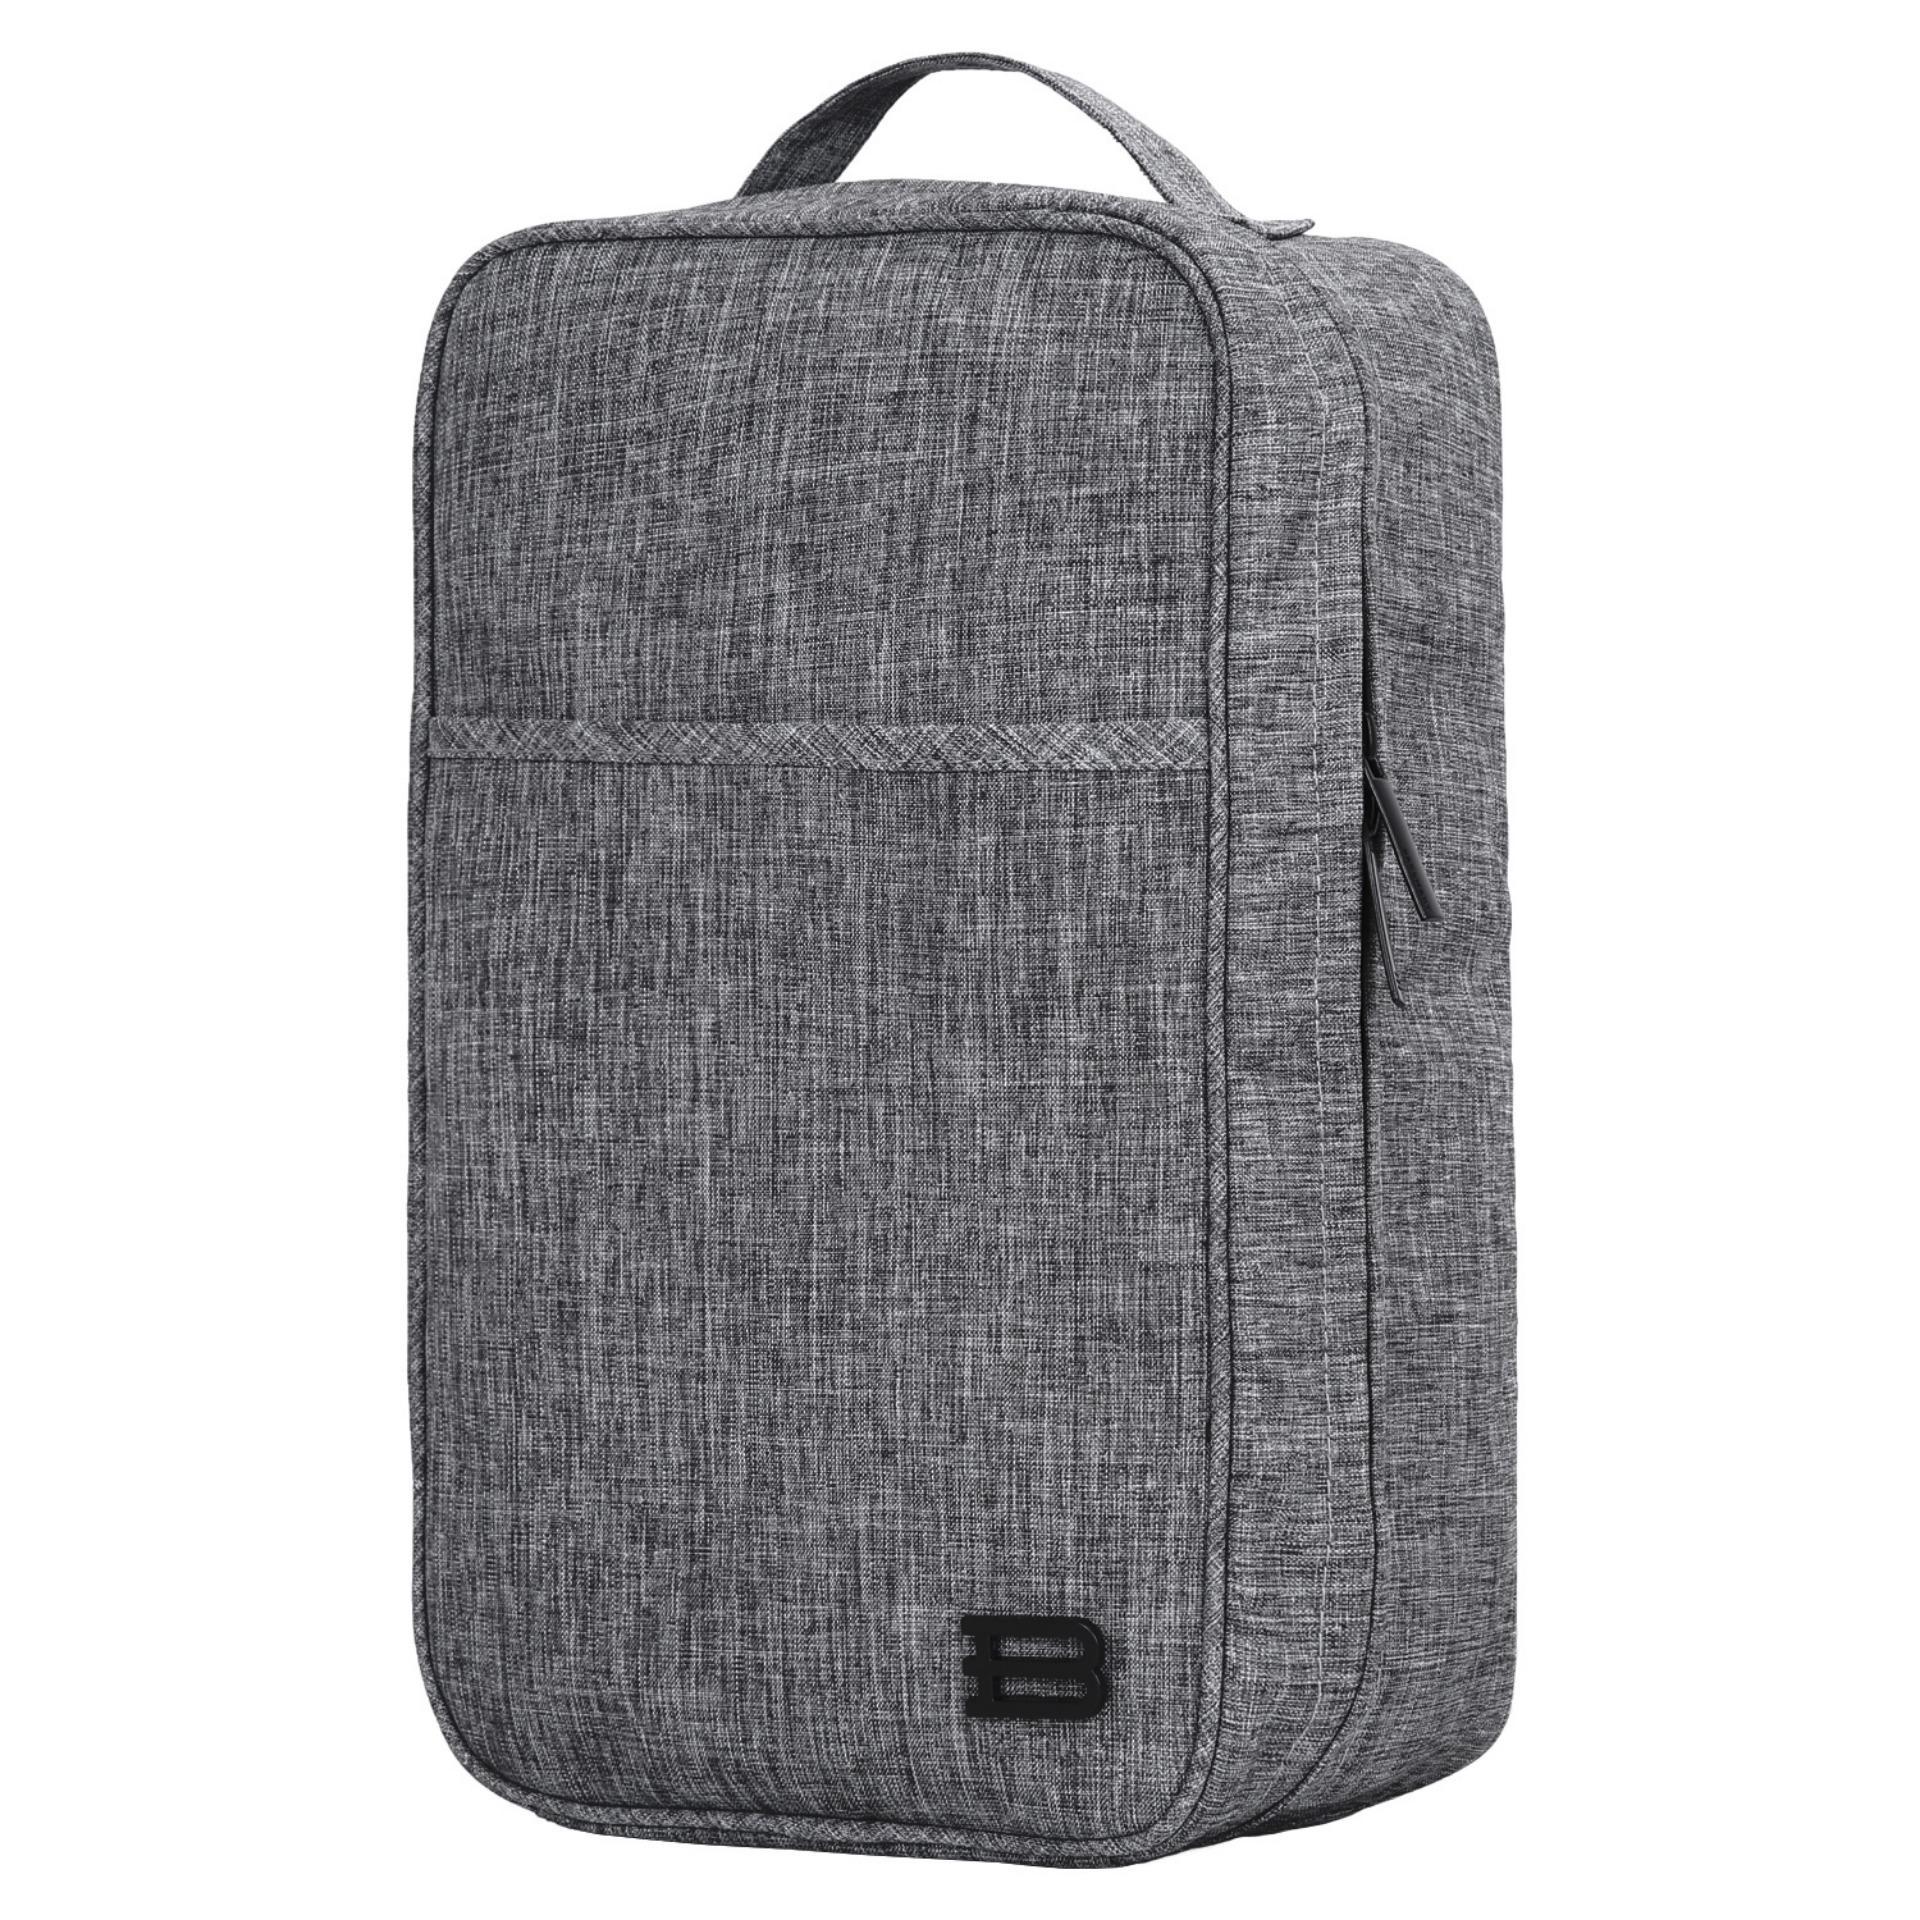 Bagsmart Bm0200086a008 Portable Travel Shoe Bags With Zipper Closure Gym Sport Tote